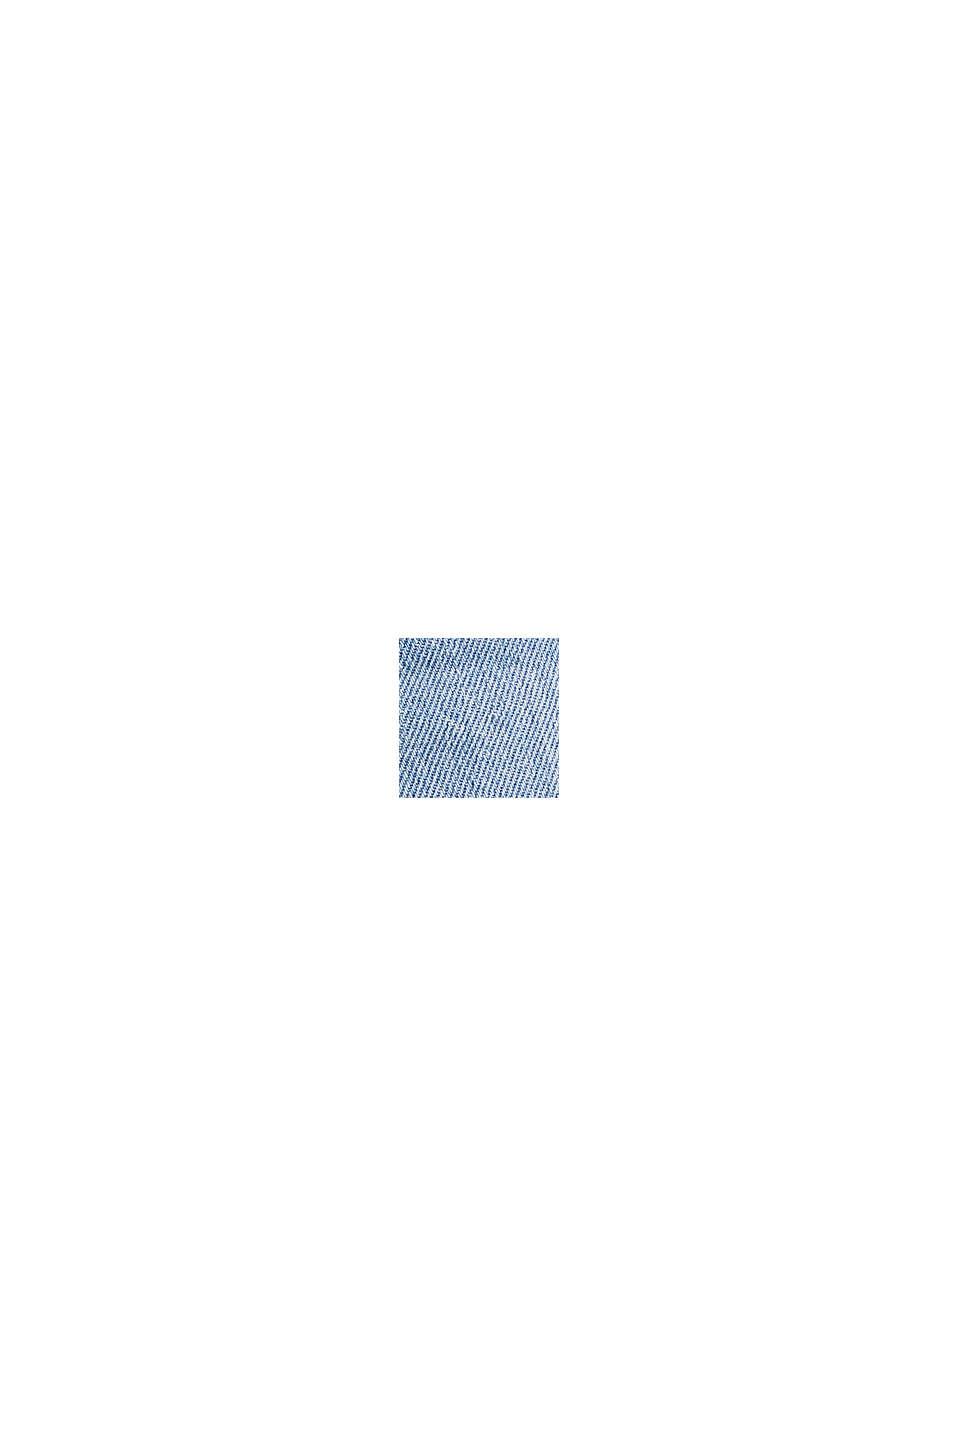 Denim-Shorts mit Organic Cotton, BLUE LIGHT WASHED, swatch